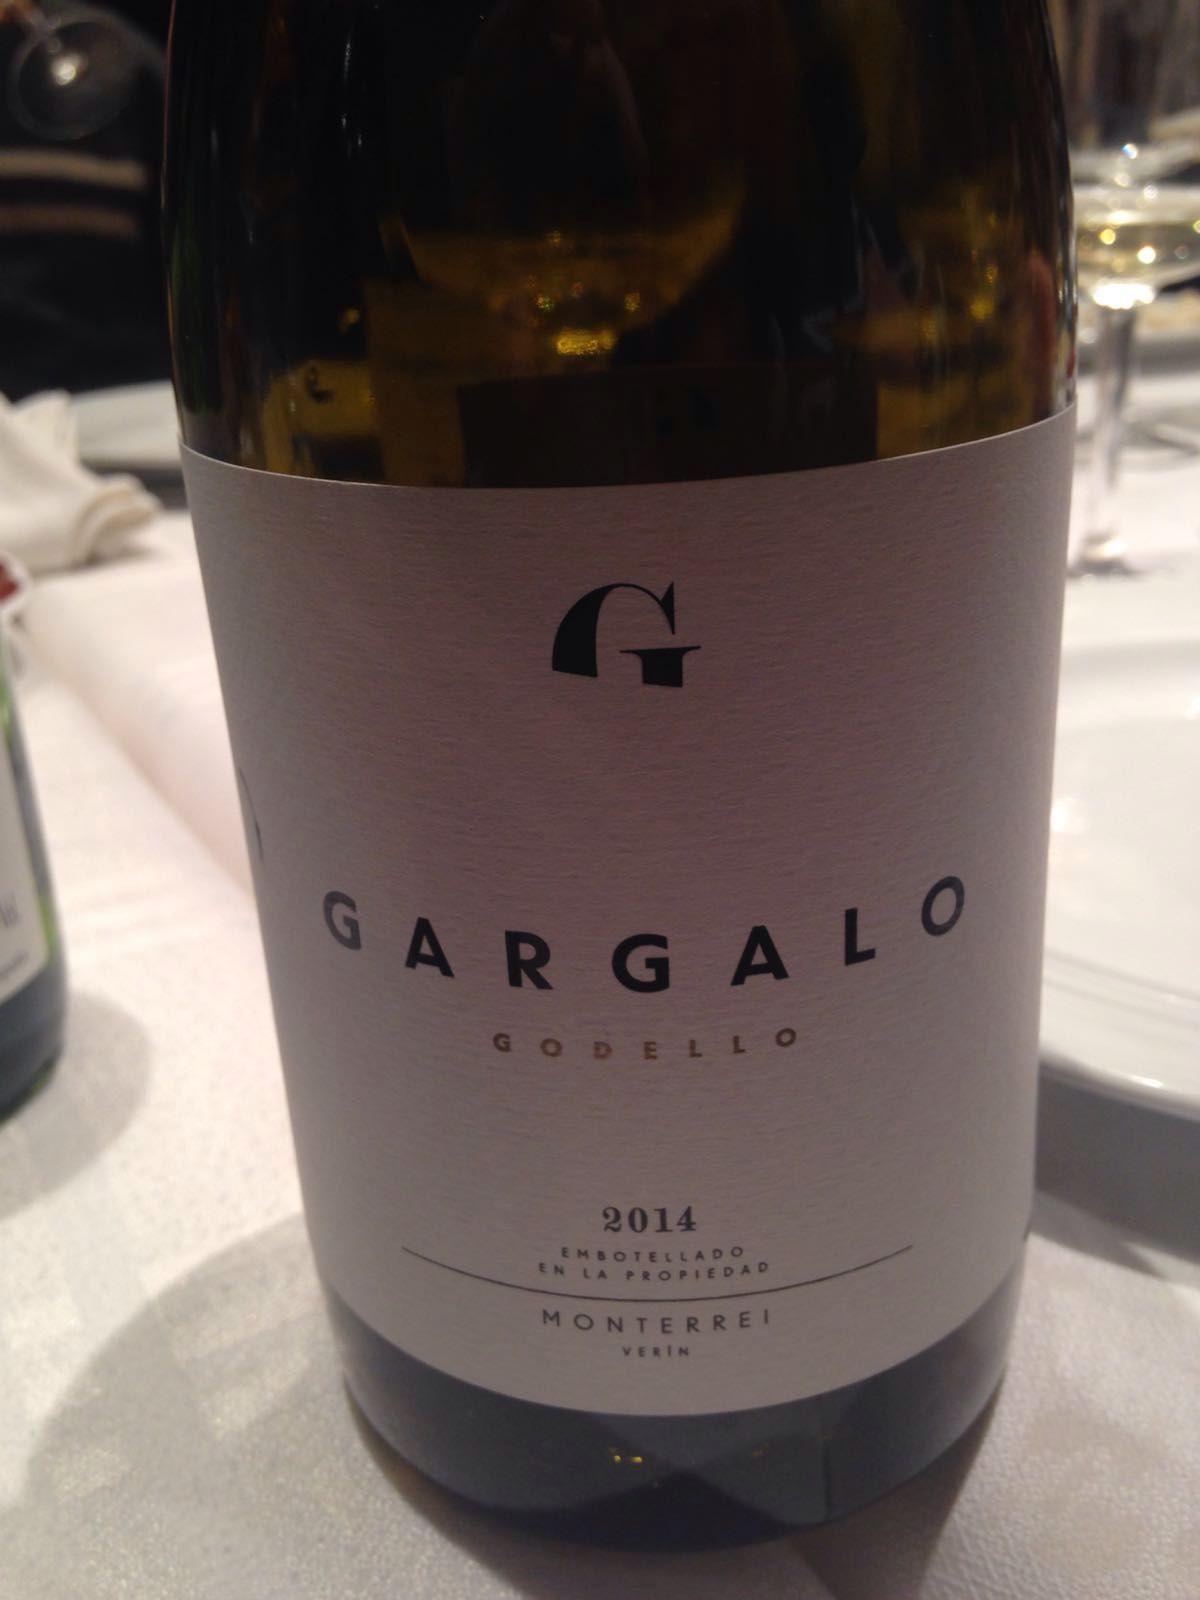 Vino Gargallo 2014 Godello